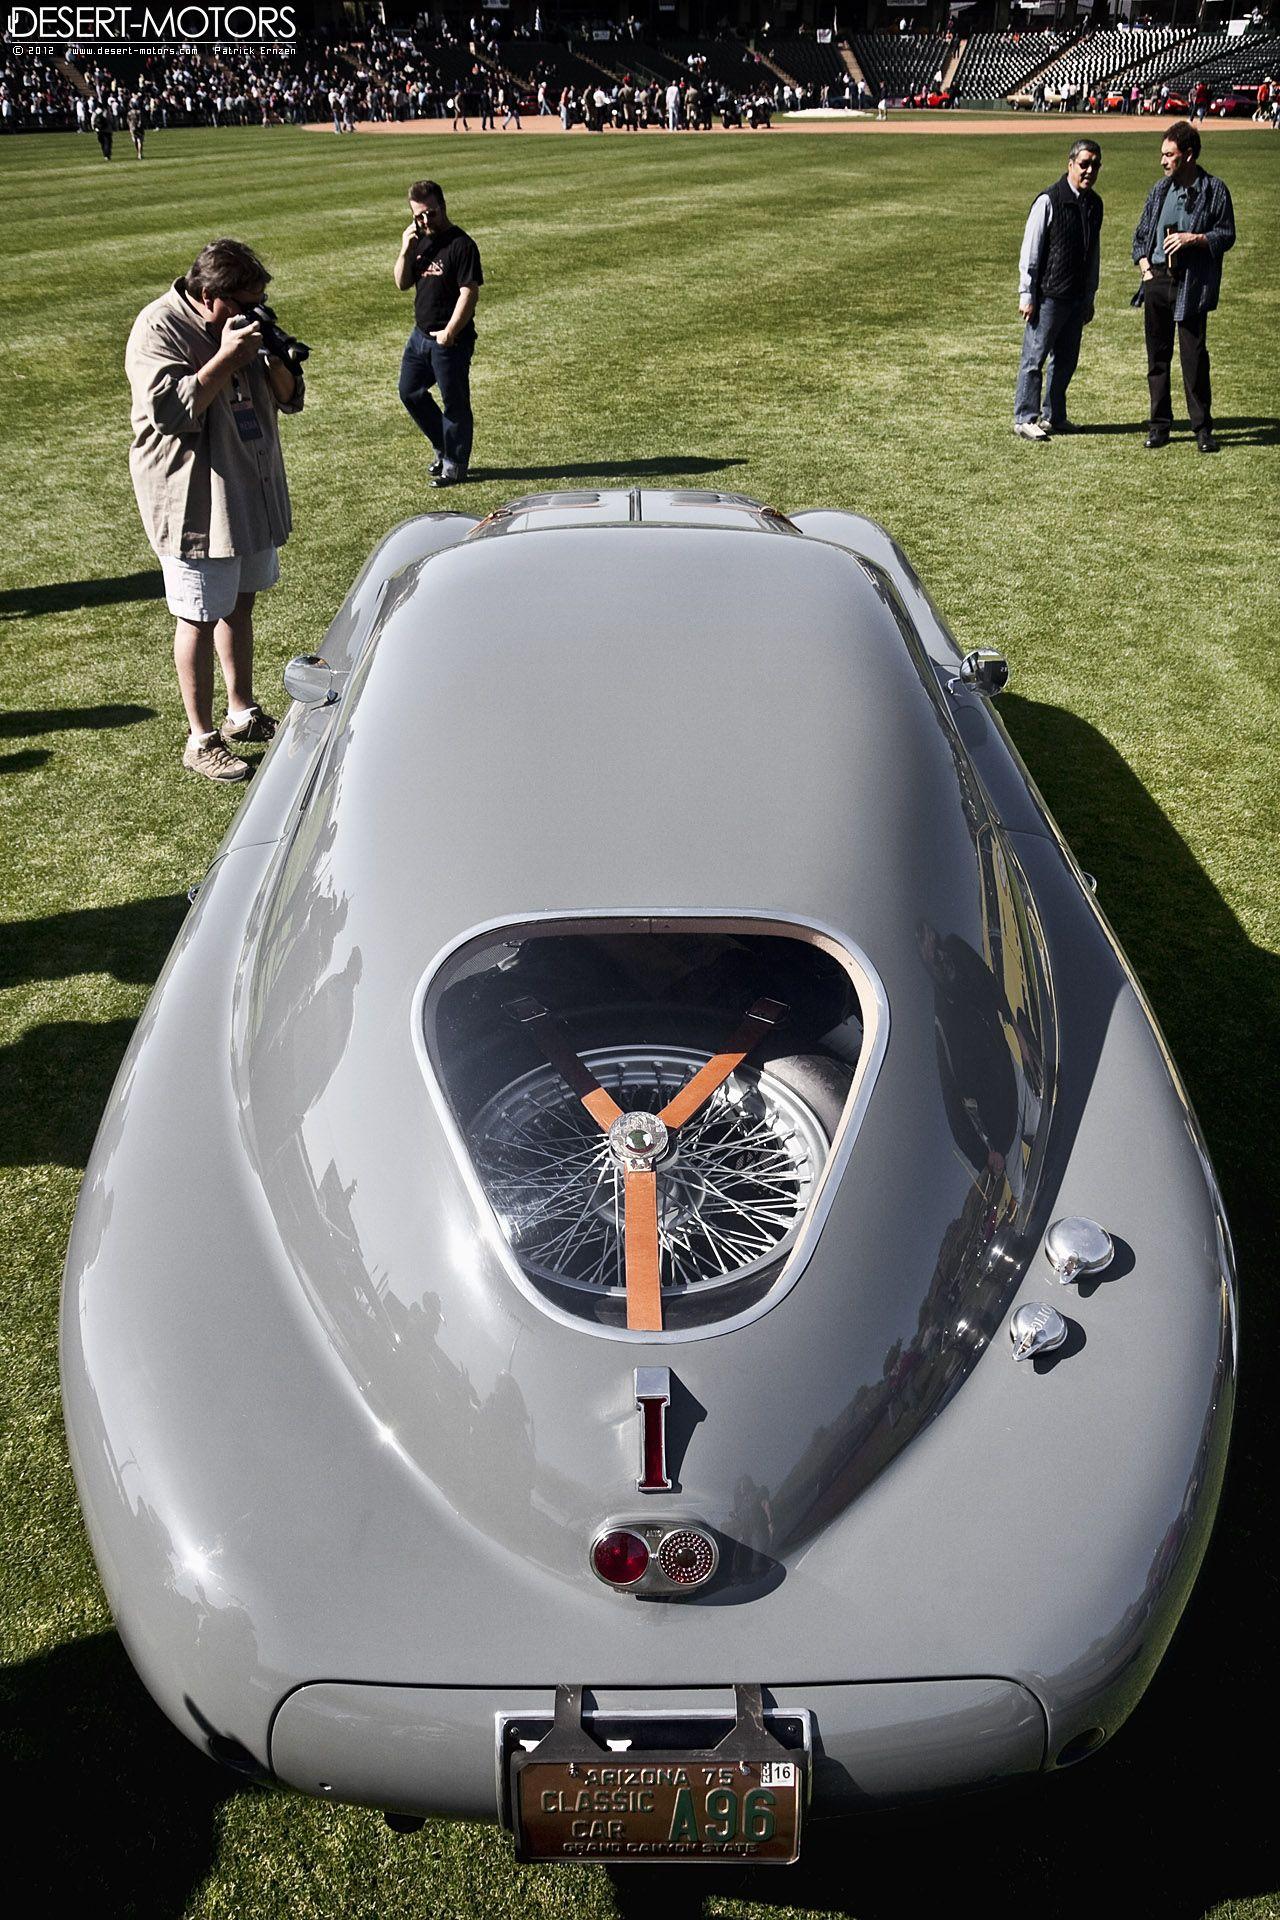 1942 Alfa Romeo 6C 2500 SS Berlinetta Aerodynamica